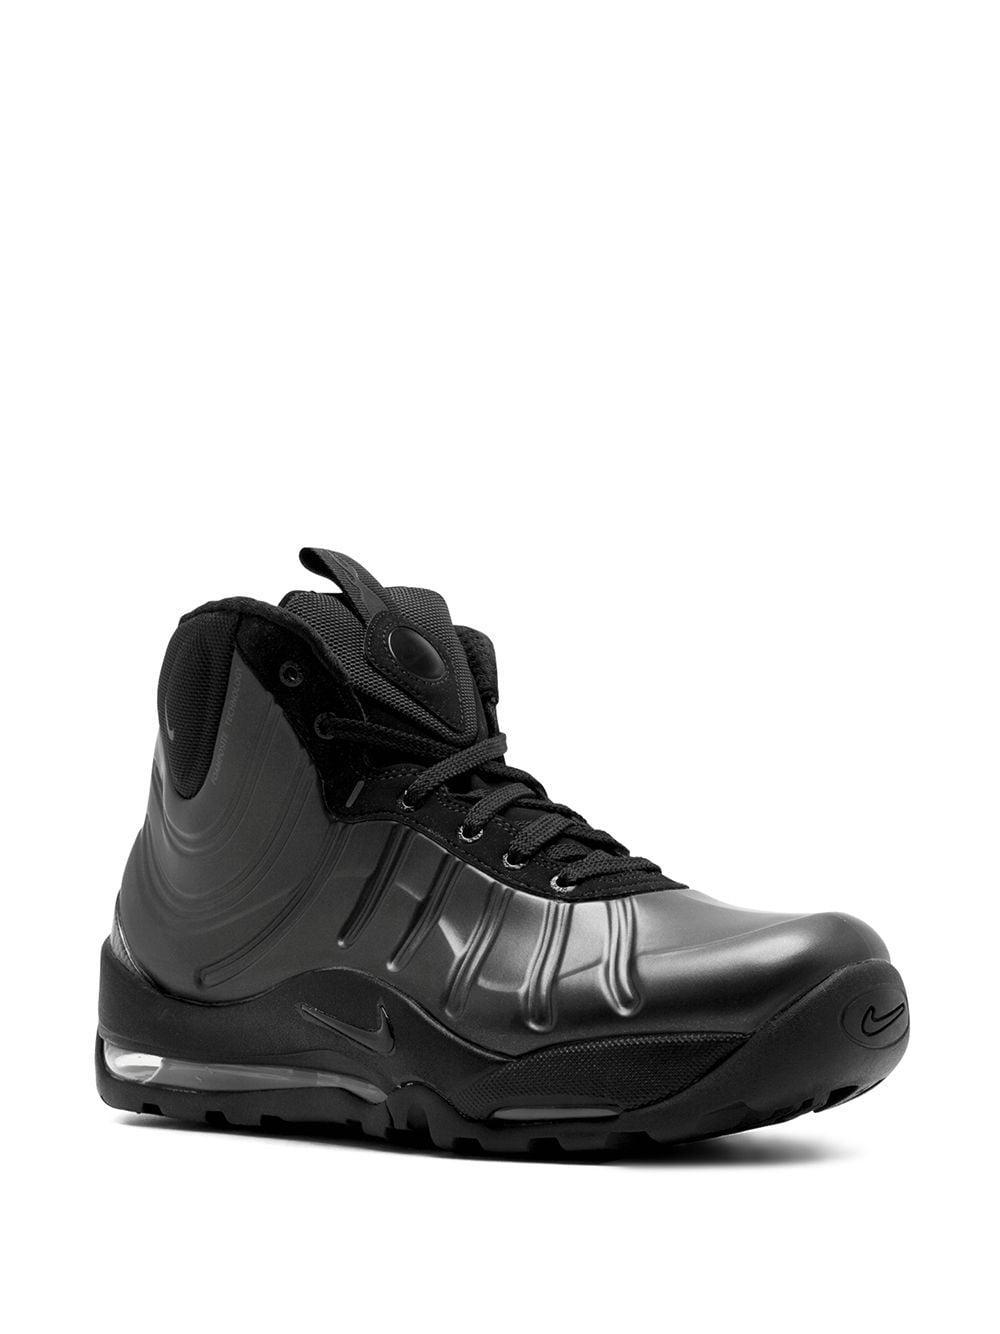 Zapatillas Air Bakin Posite Nike de Caucho de color Negro